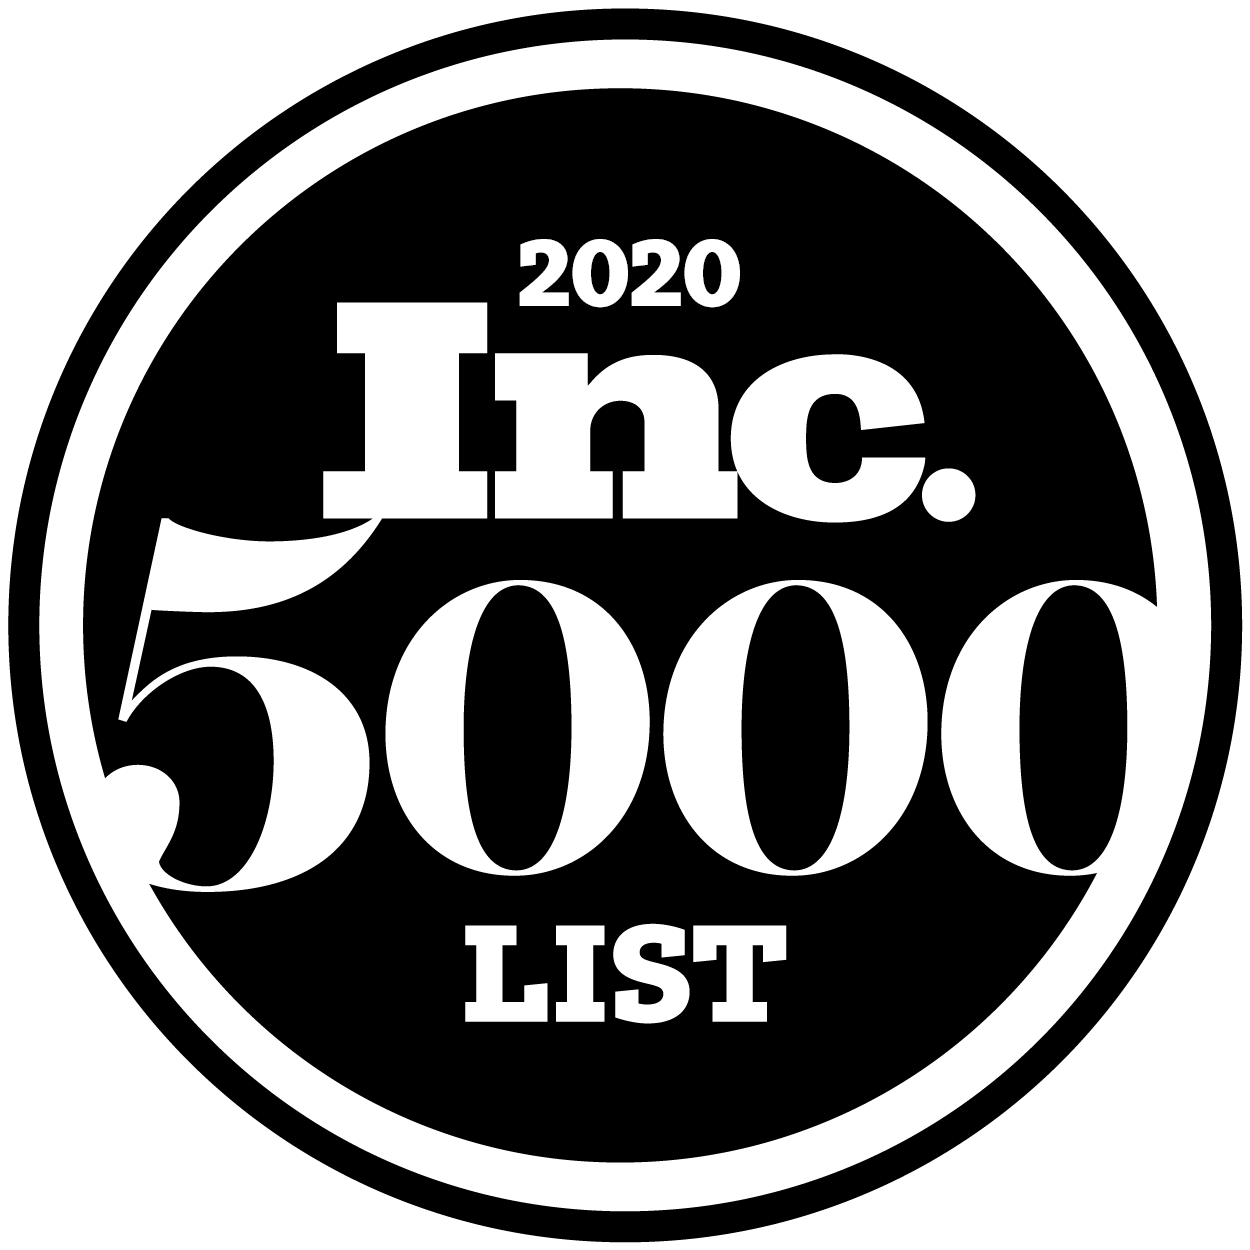 Kisi Inc. 5000